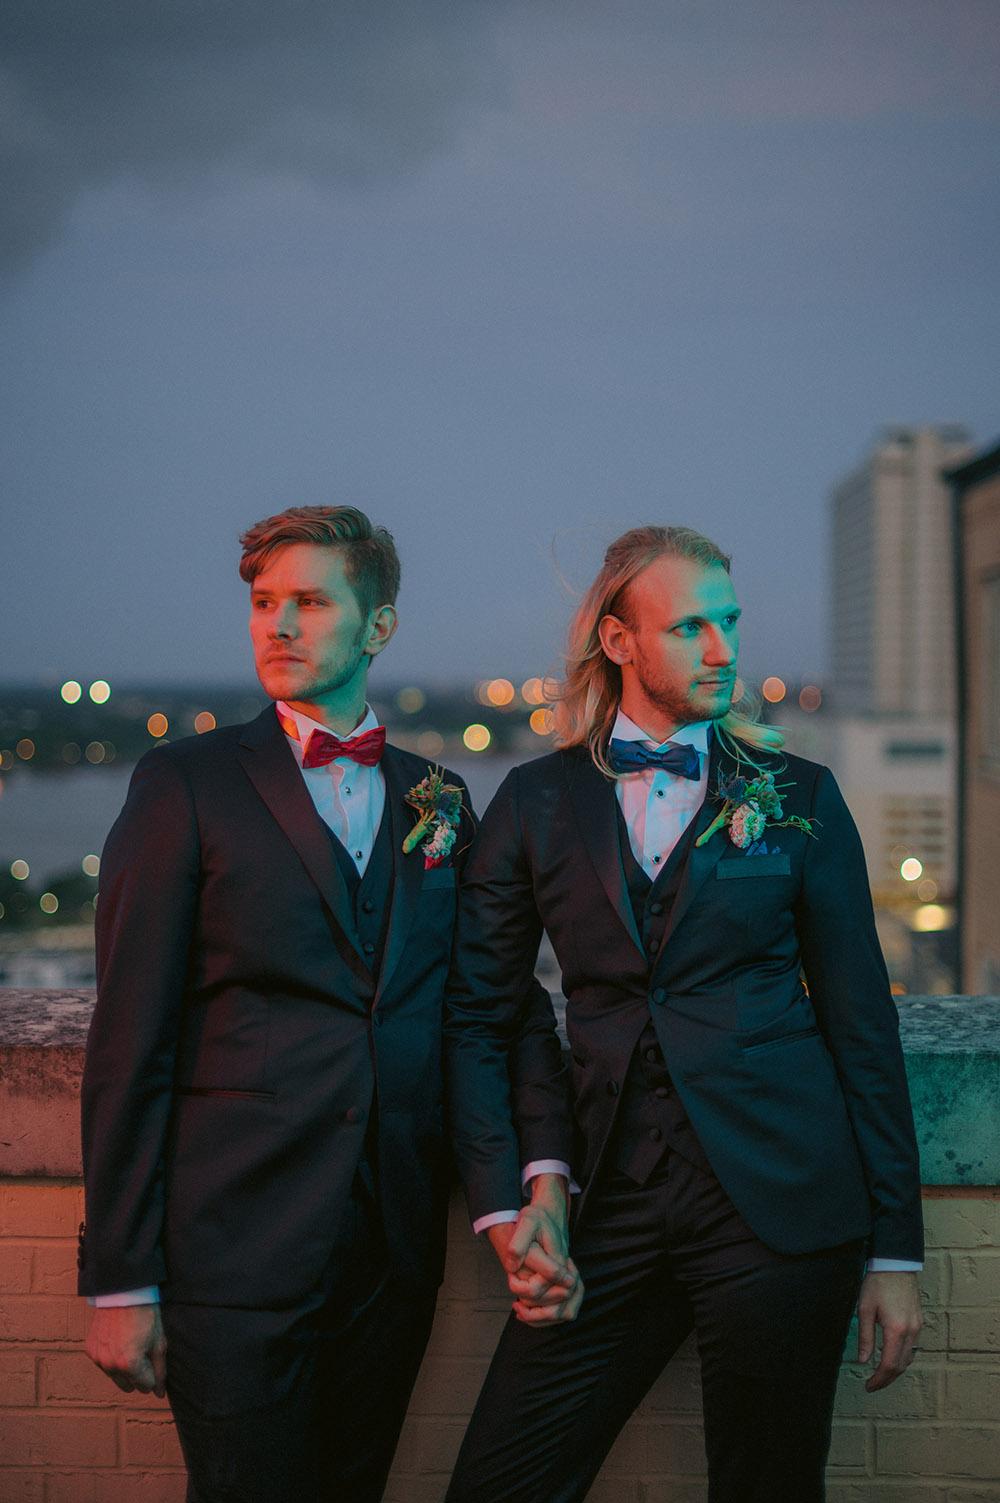 Wedding color groom portrait